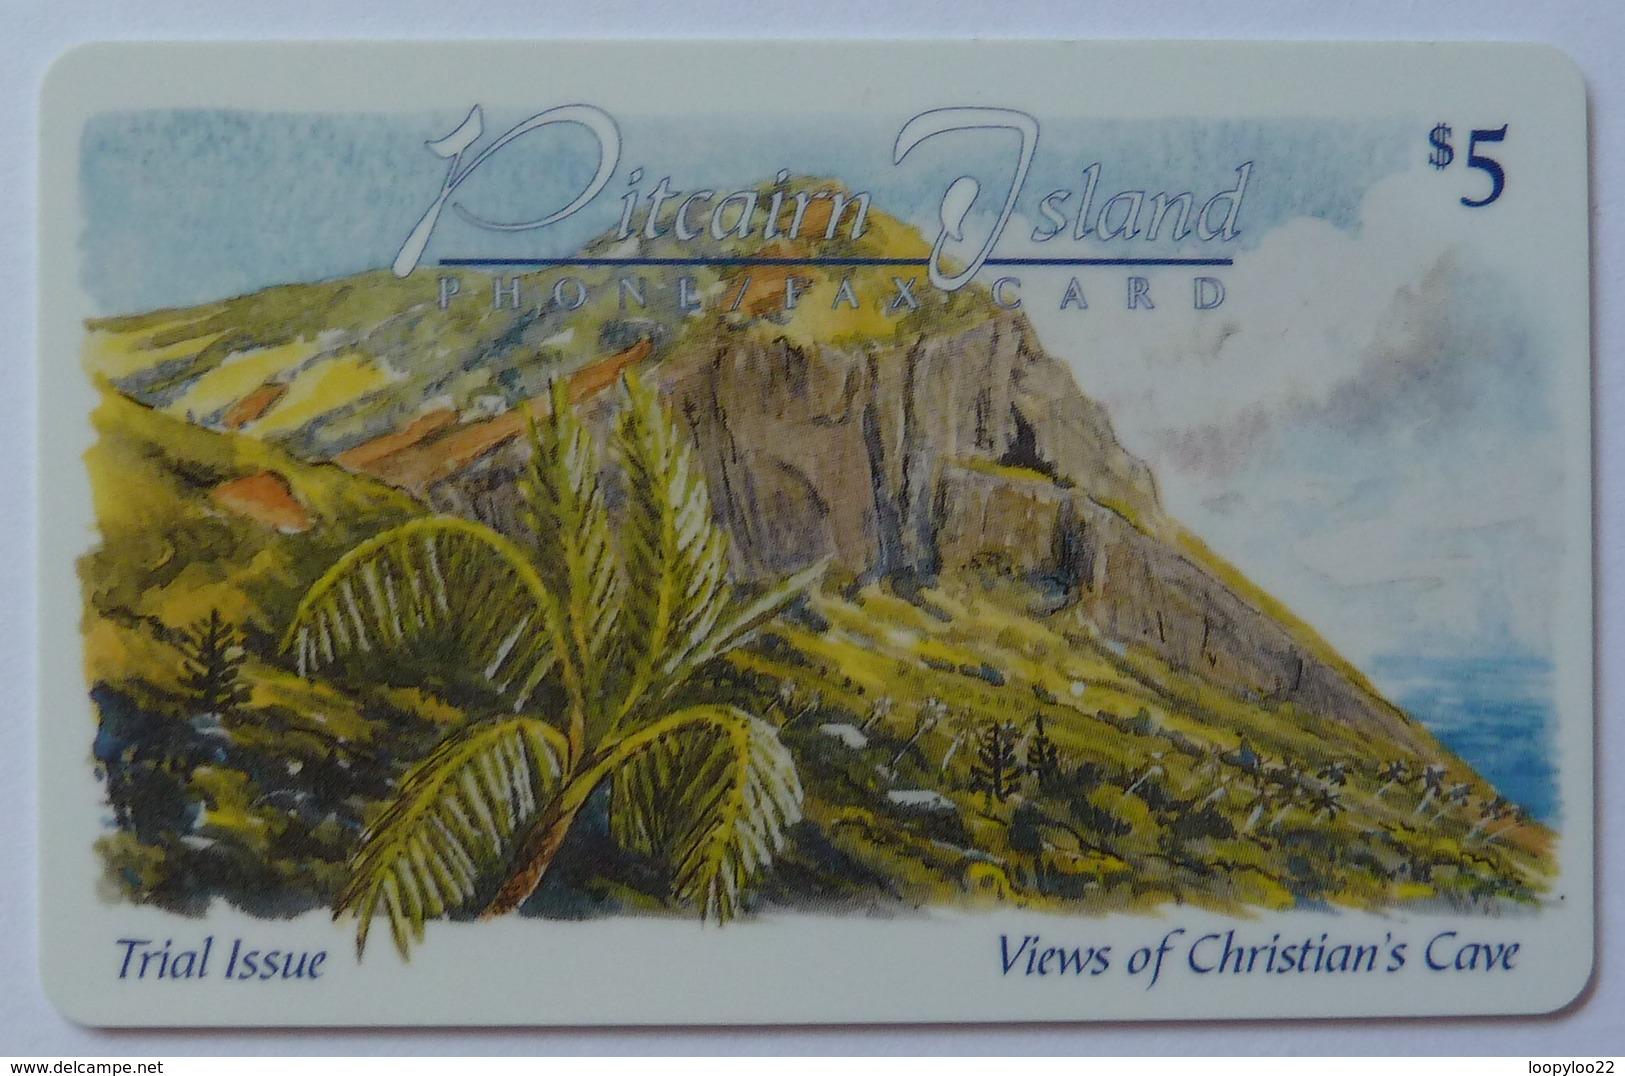 PITCAIRN ISLANDS - £5 - Trial - Views Of Christian's Cove - Mint - Pitcairn Islands